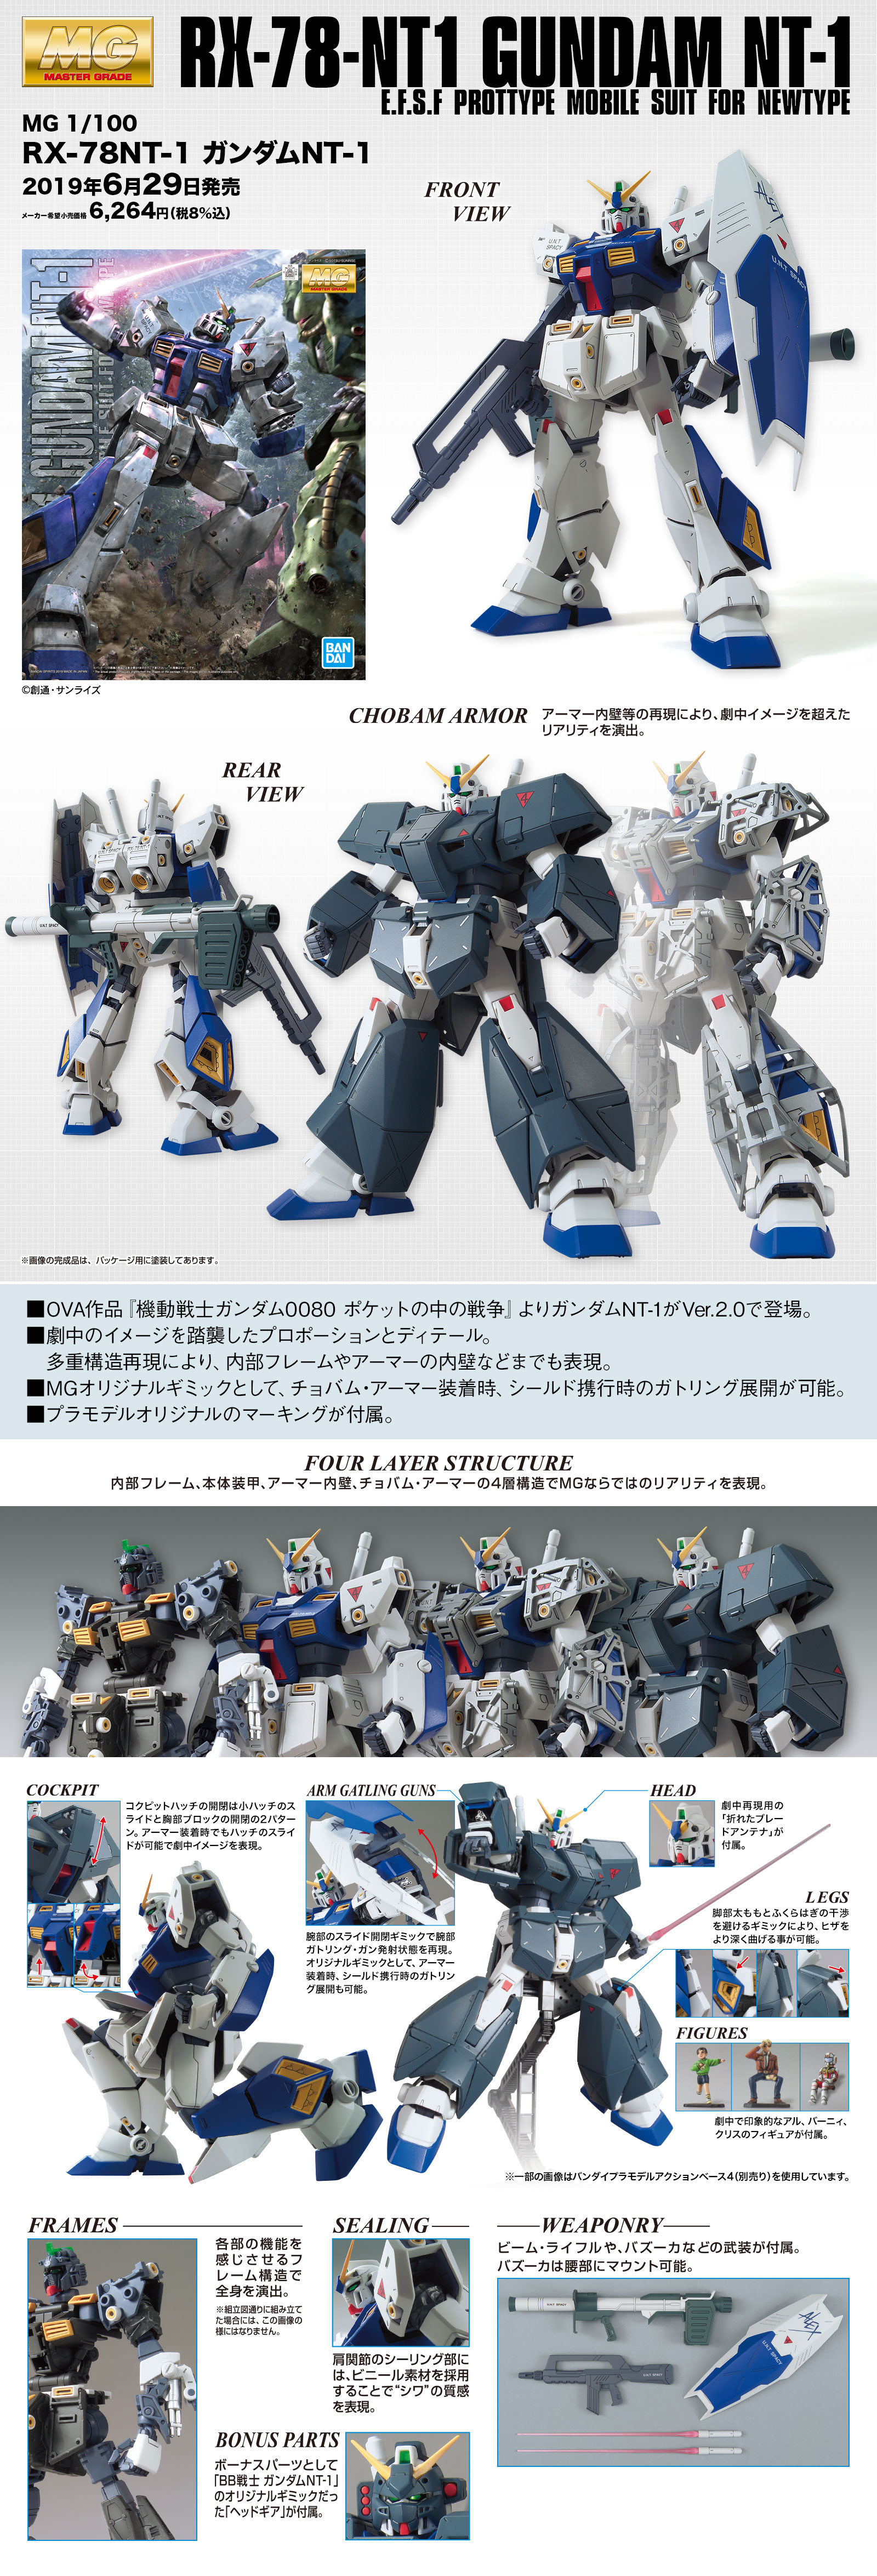 NEW IMAGES MG 1/100 GUNDAM NT-1 Ver.2.0